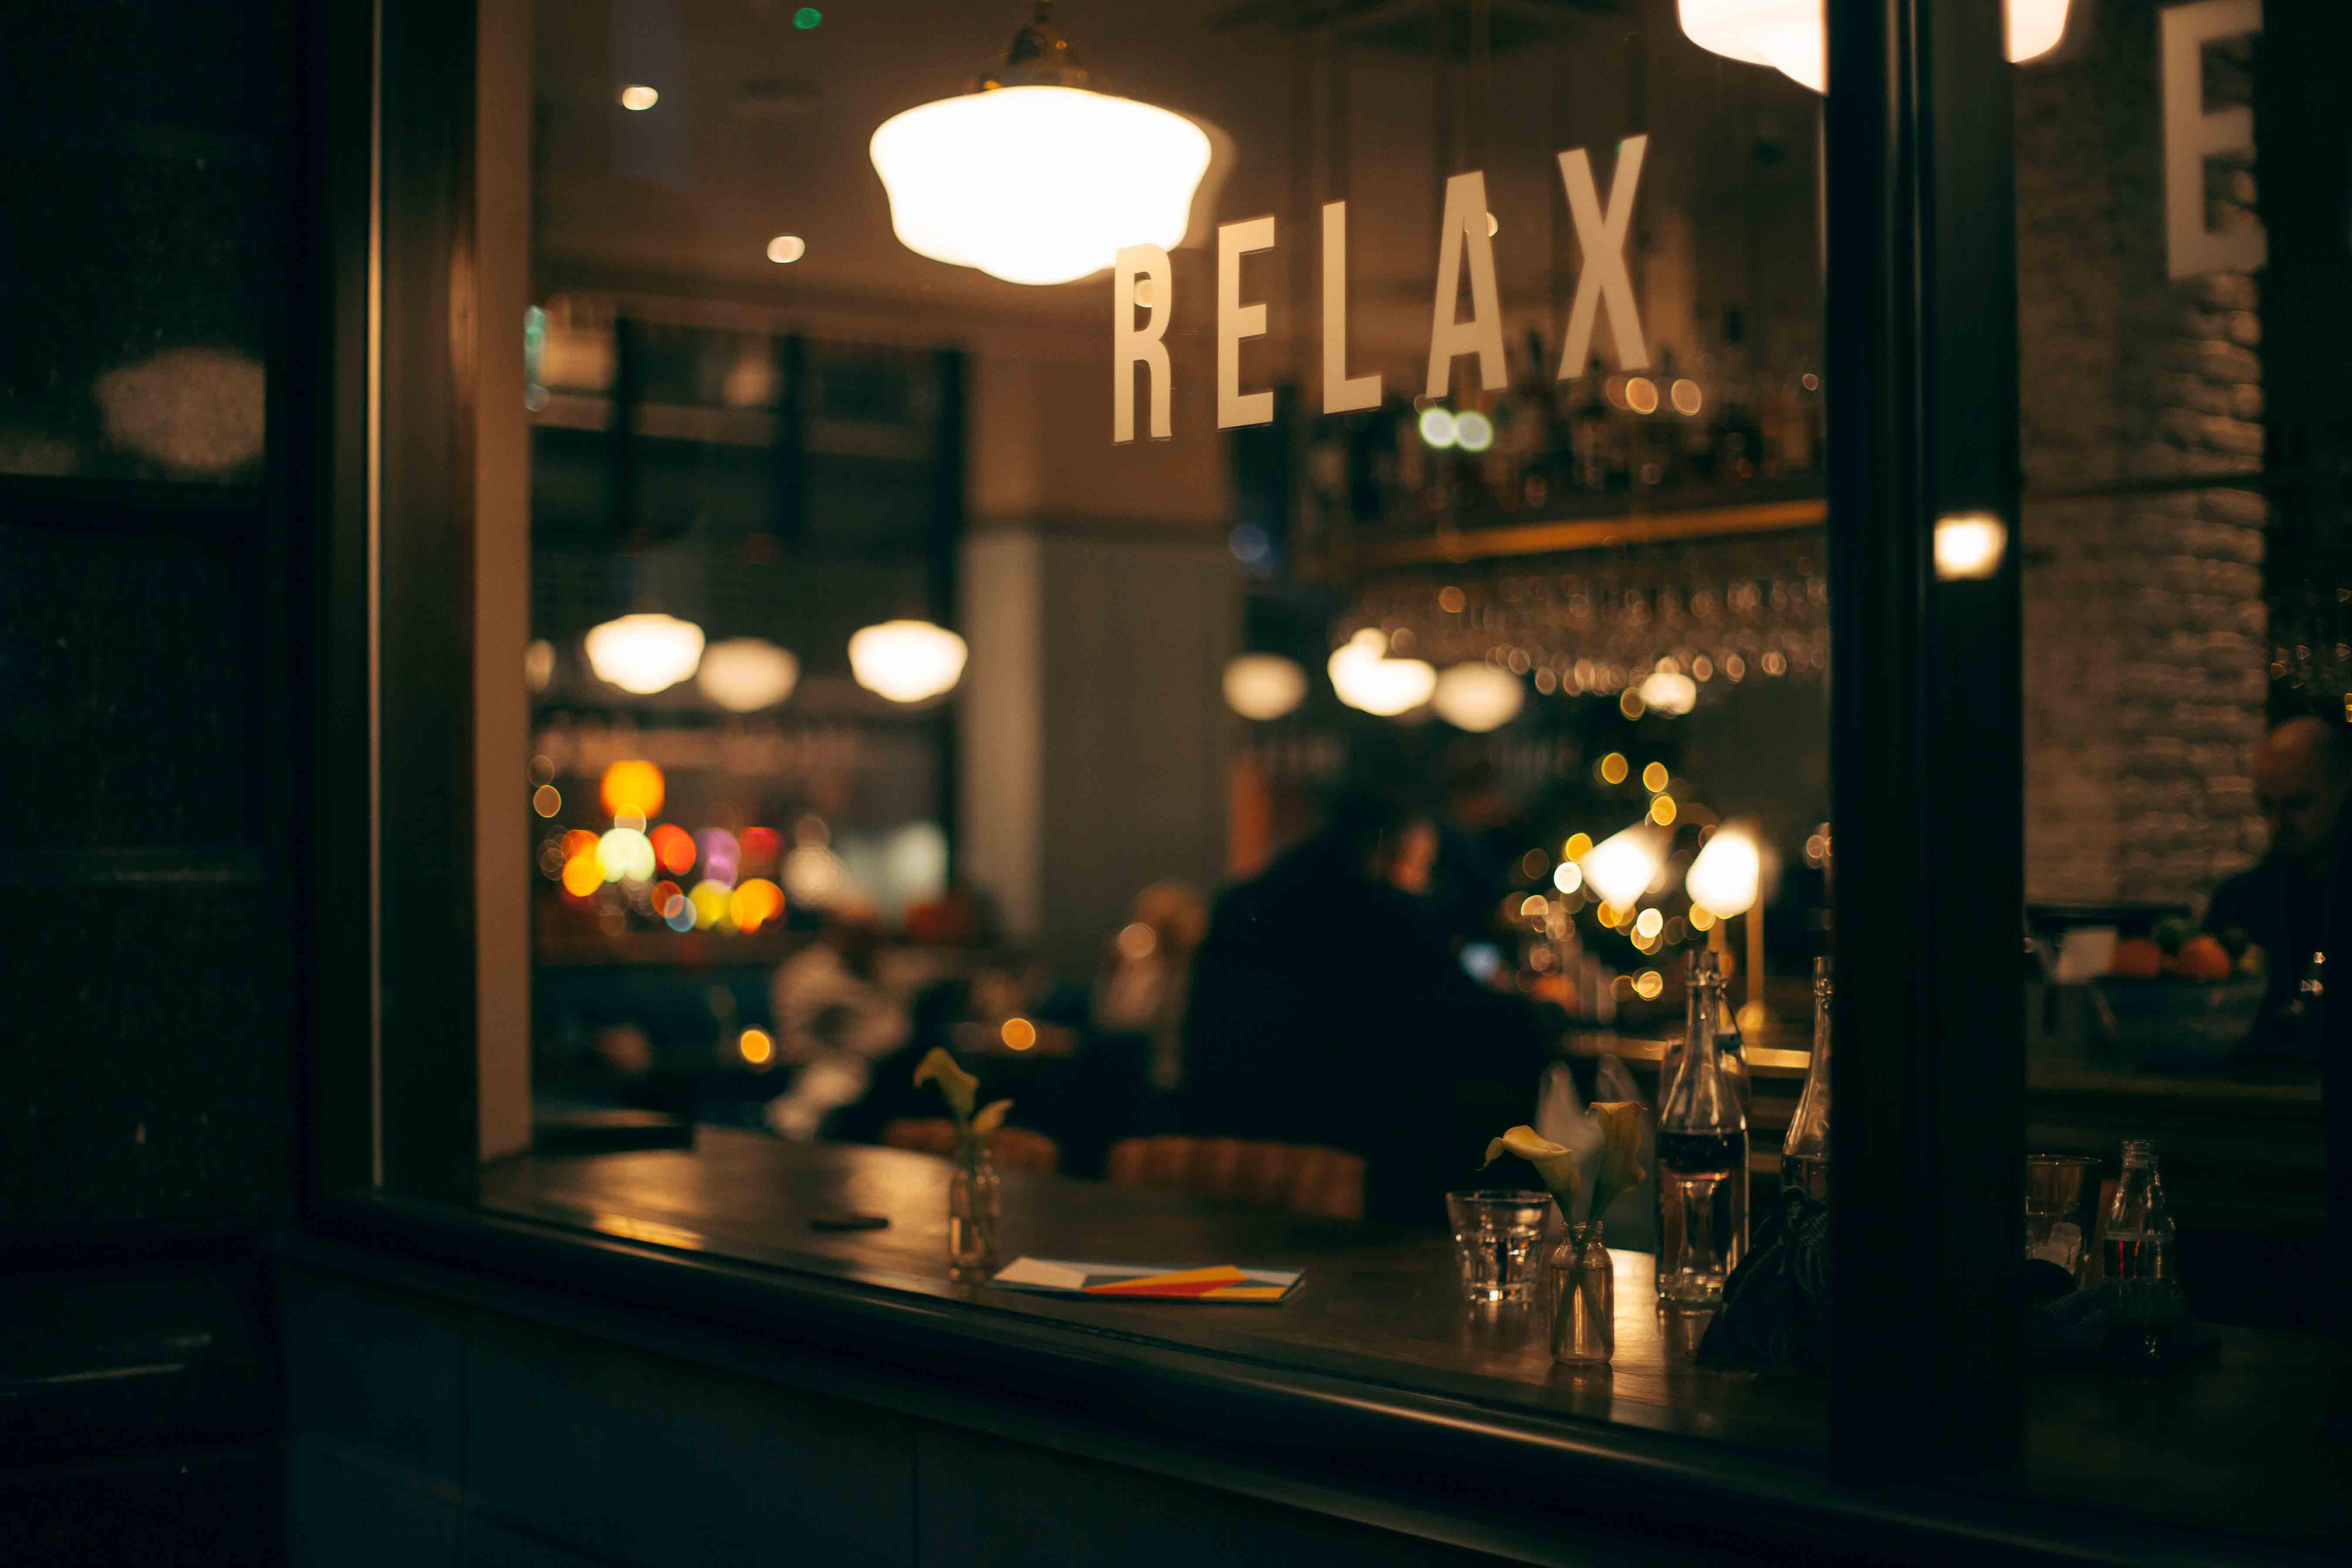 arredamento bar, scritta relax in vetrina, COMINshop